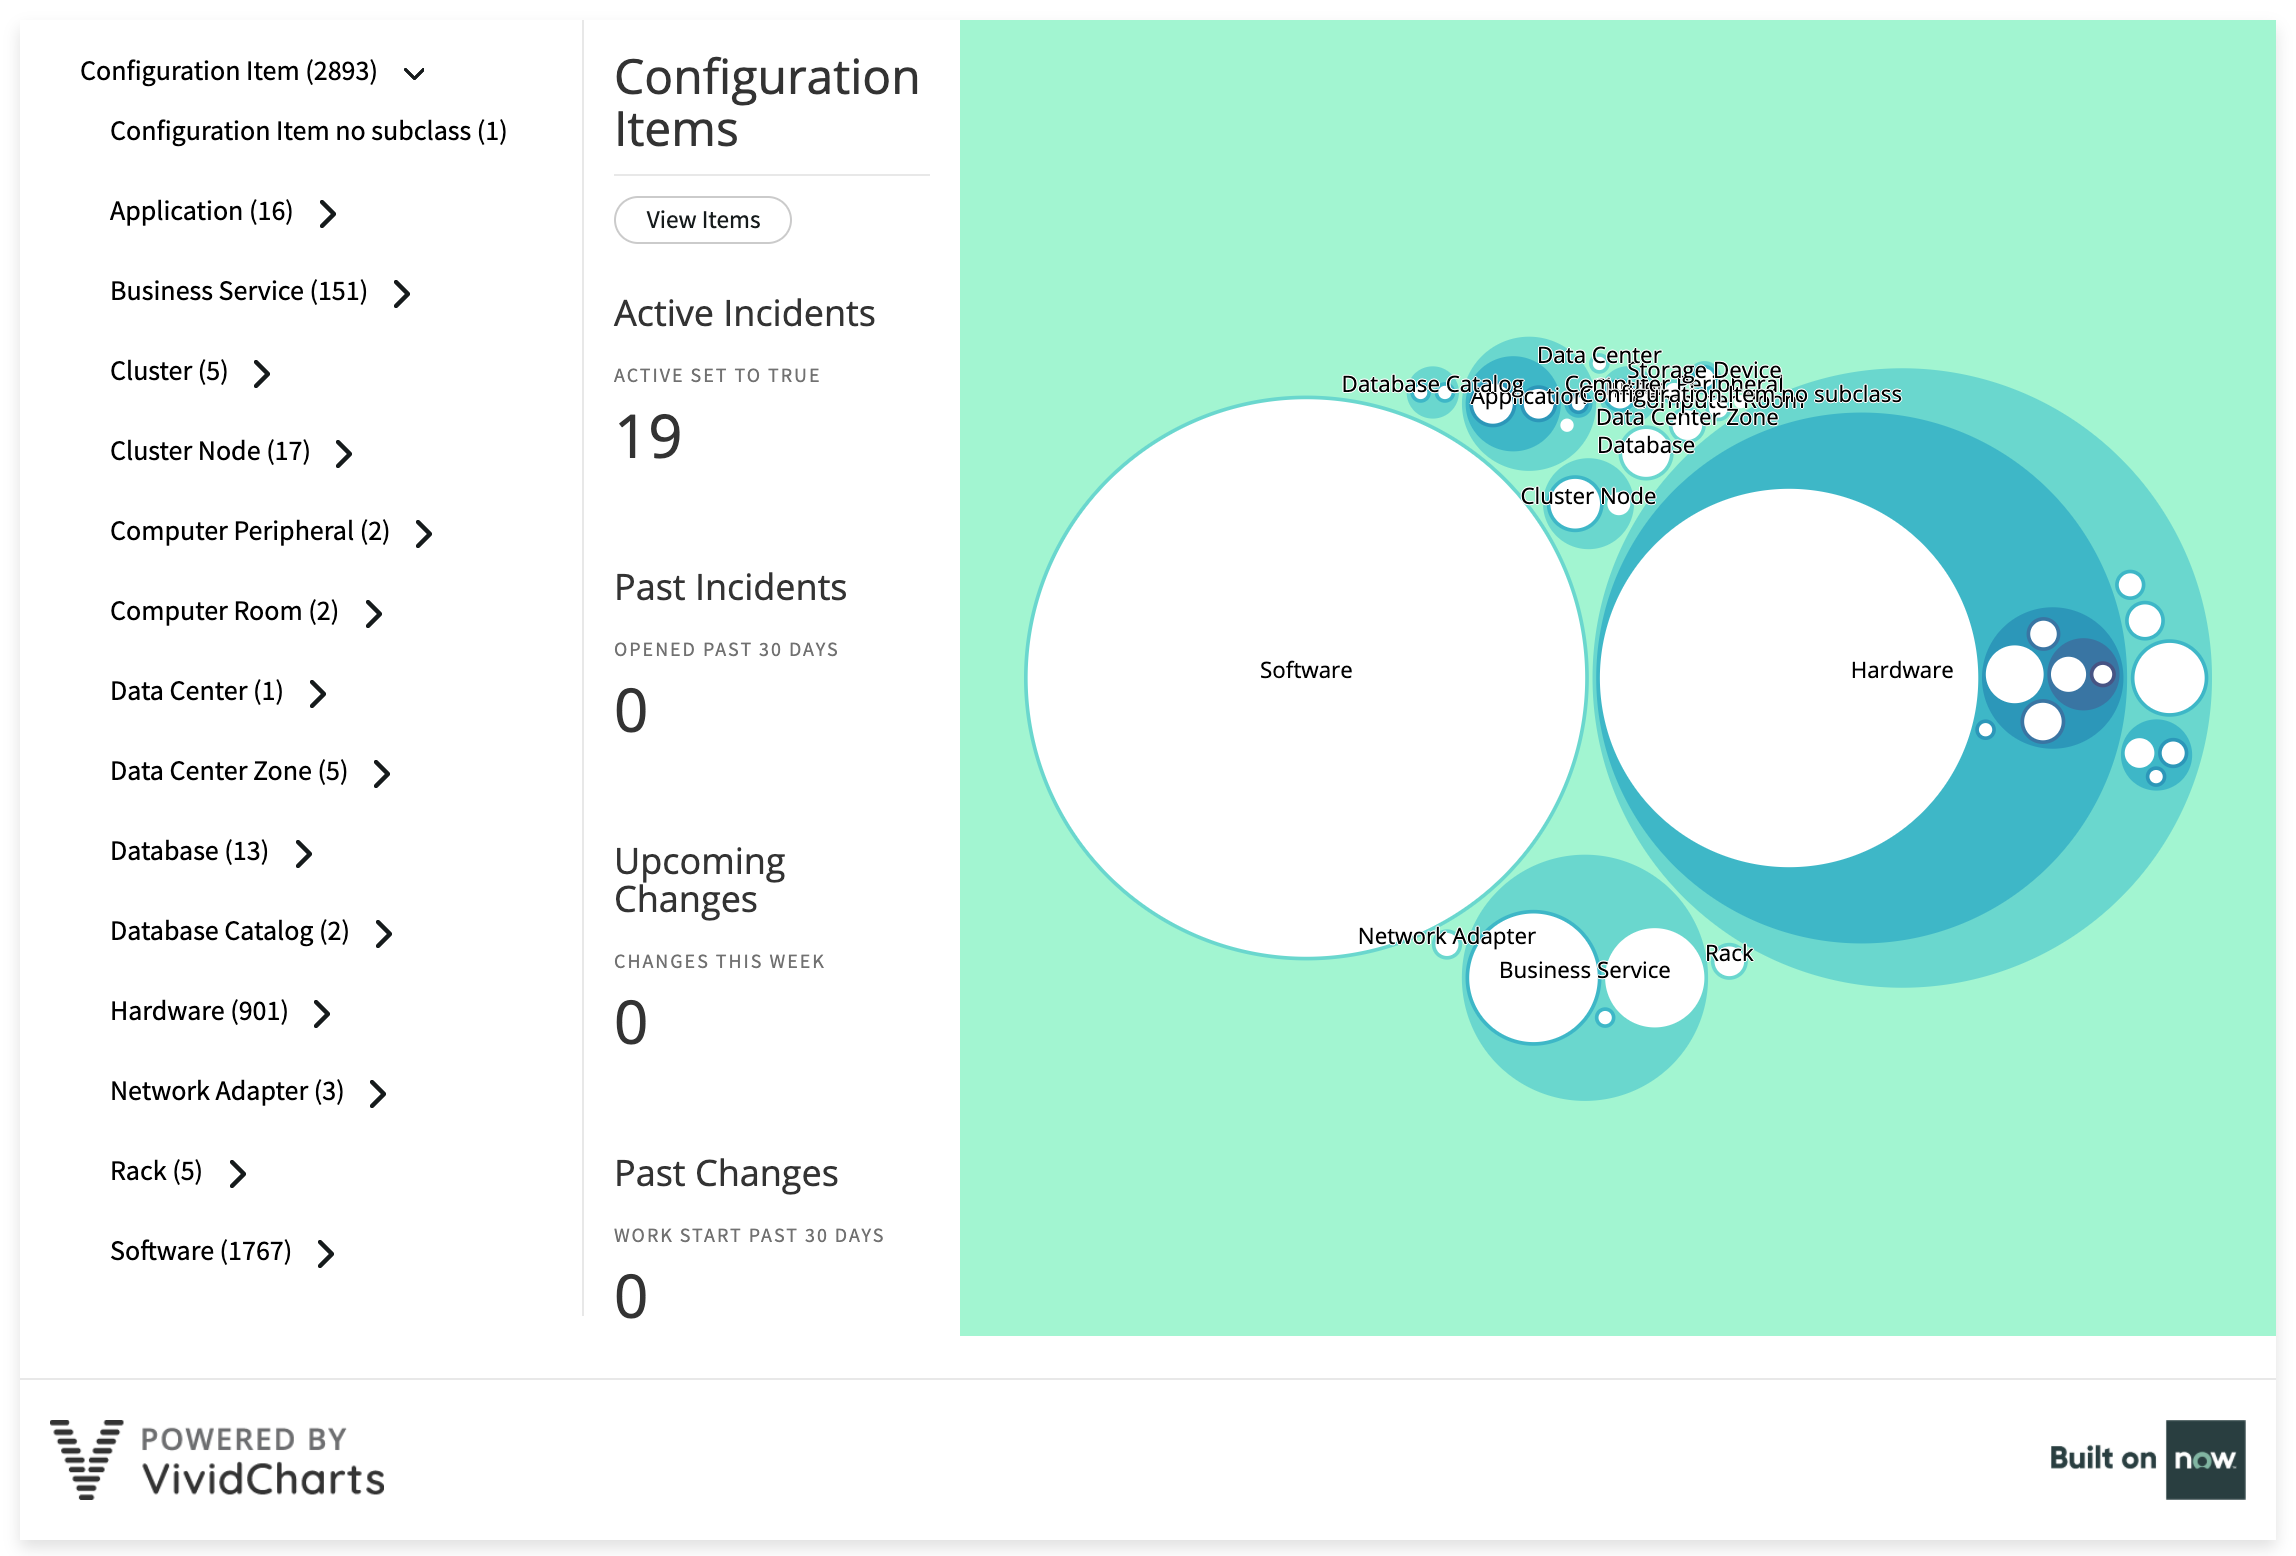 CMDB Hierarchy Visualizer